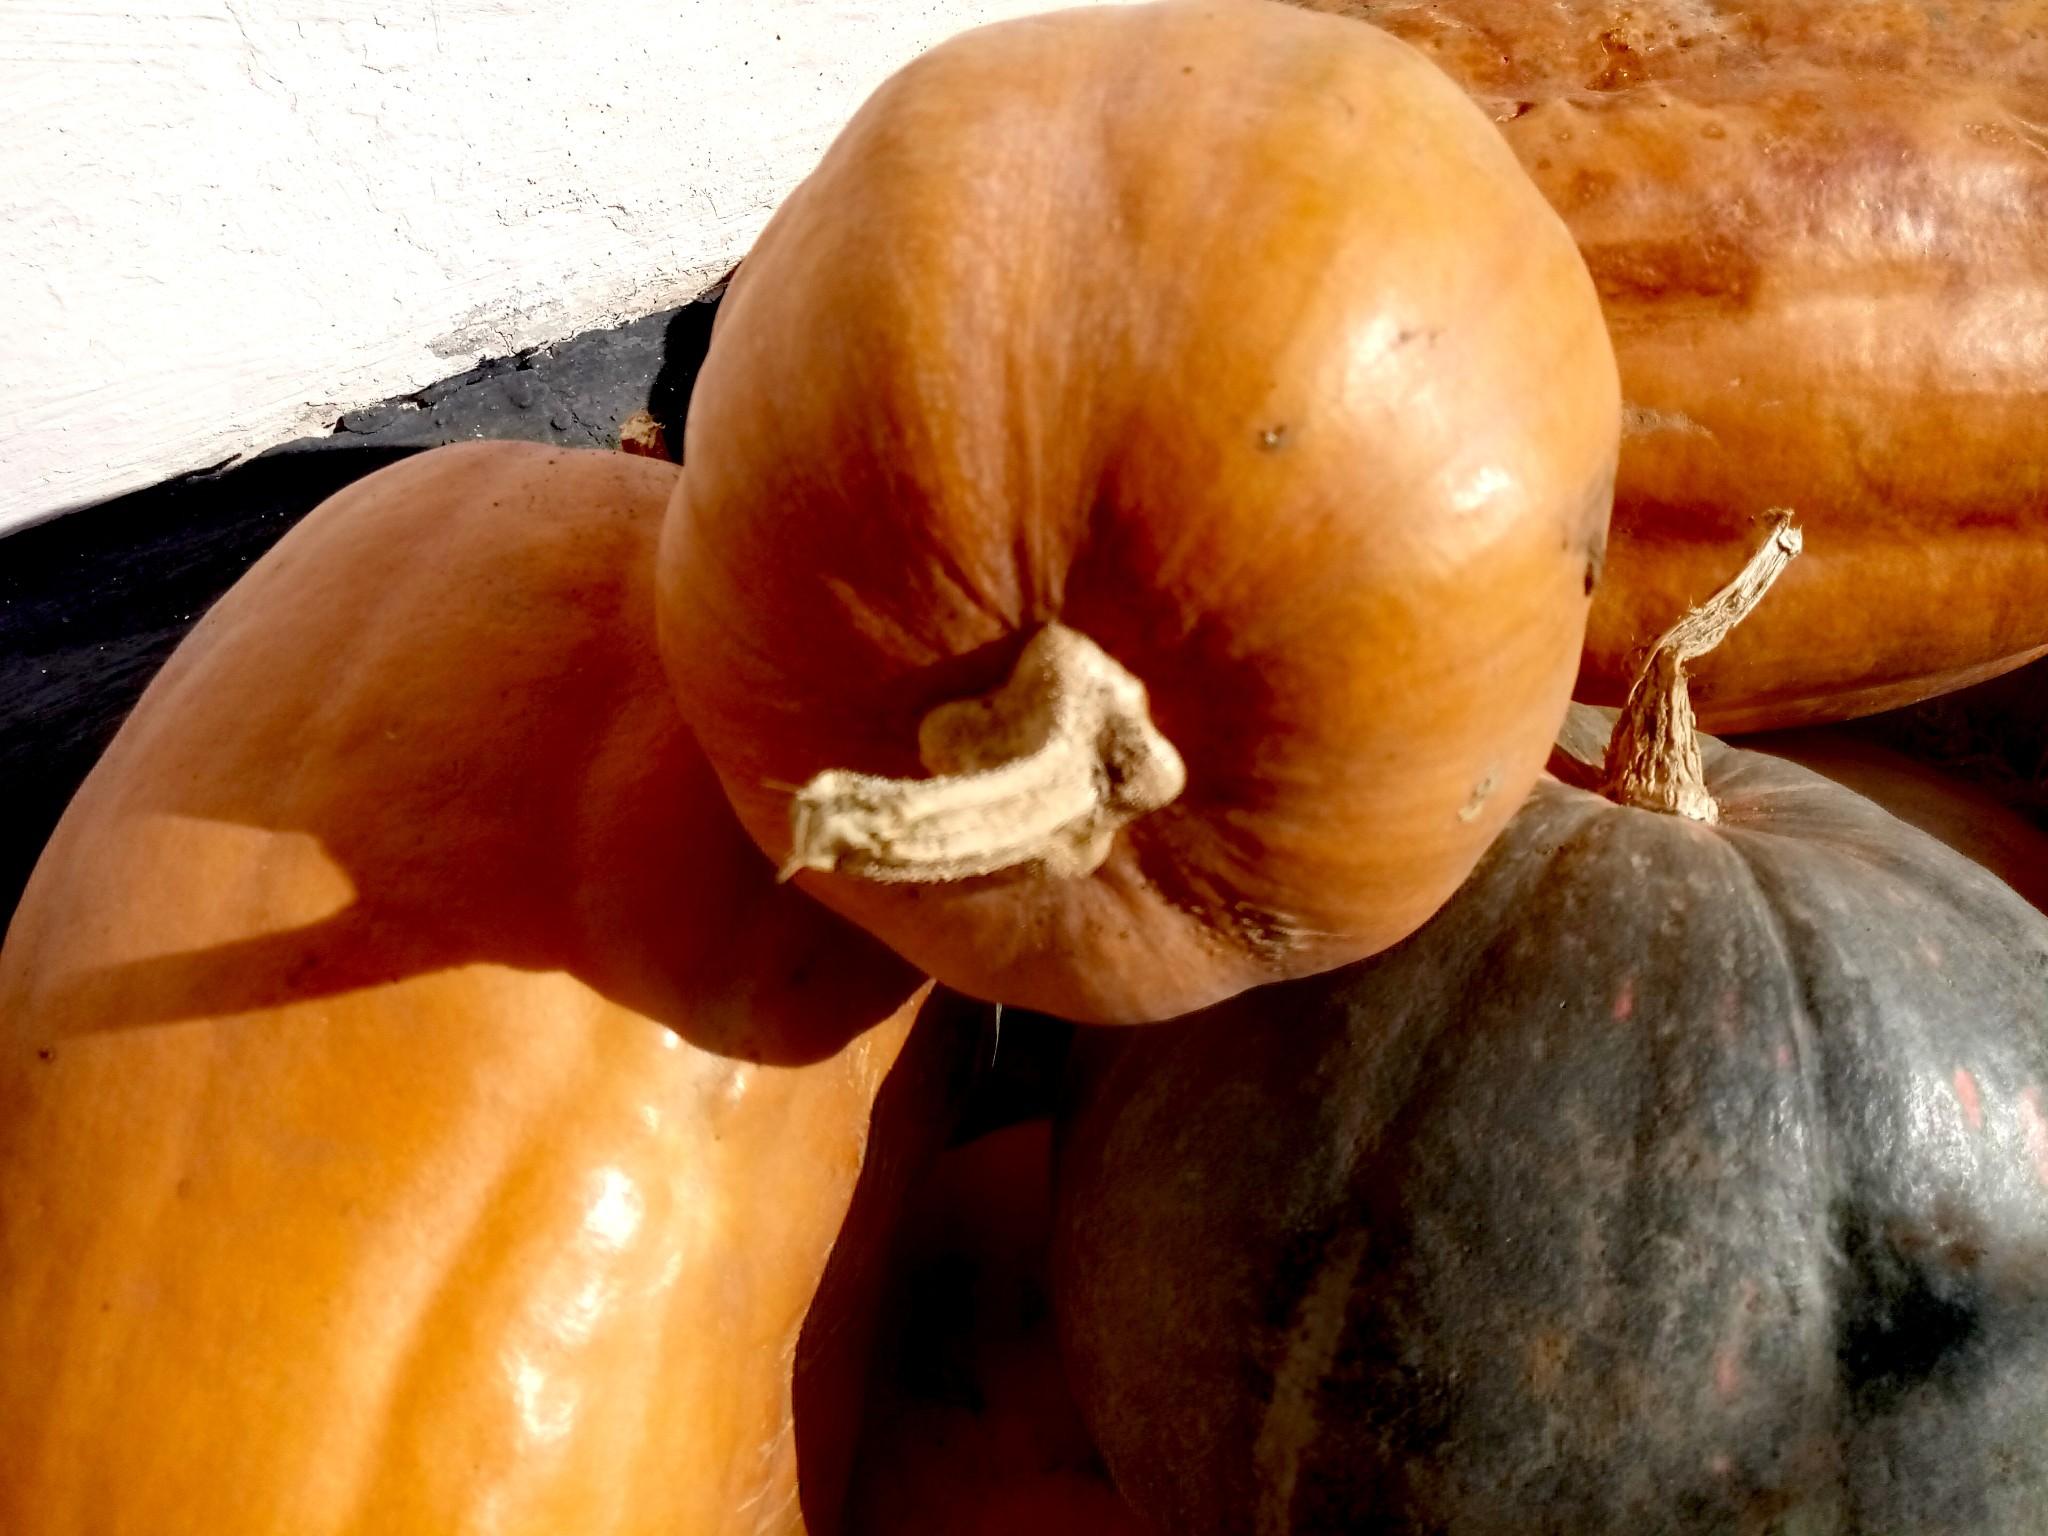 Pumpkins photo 8